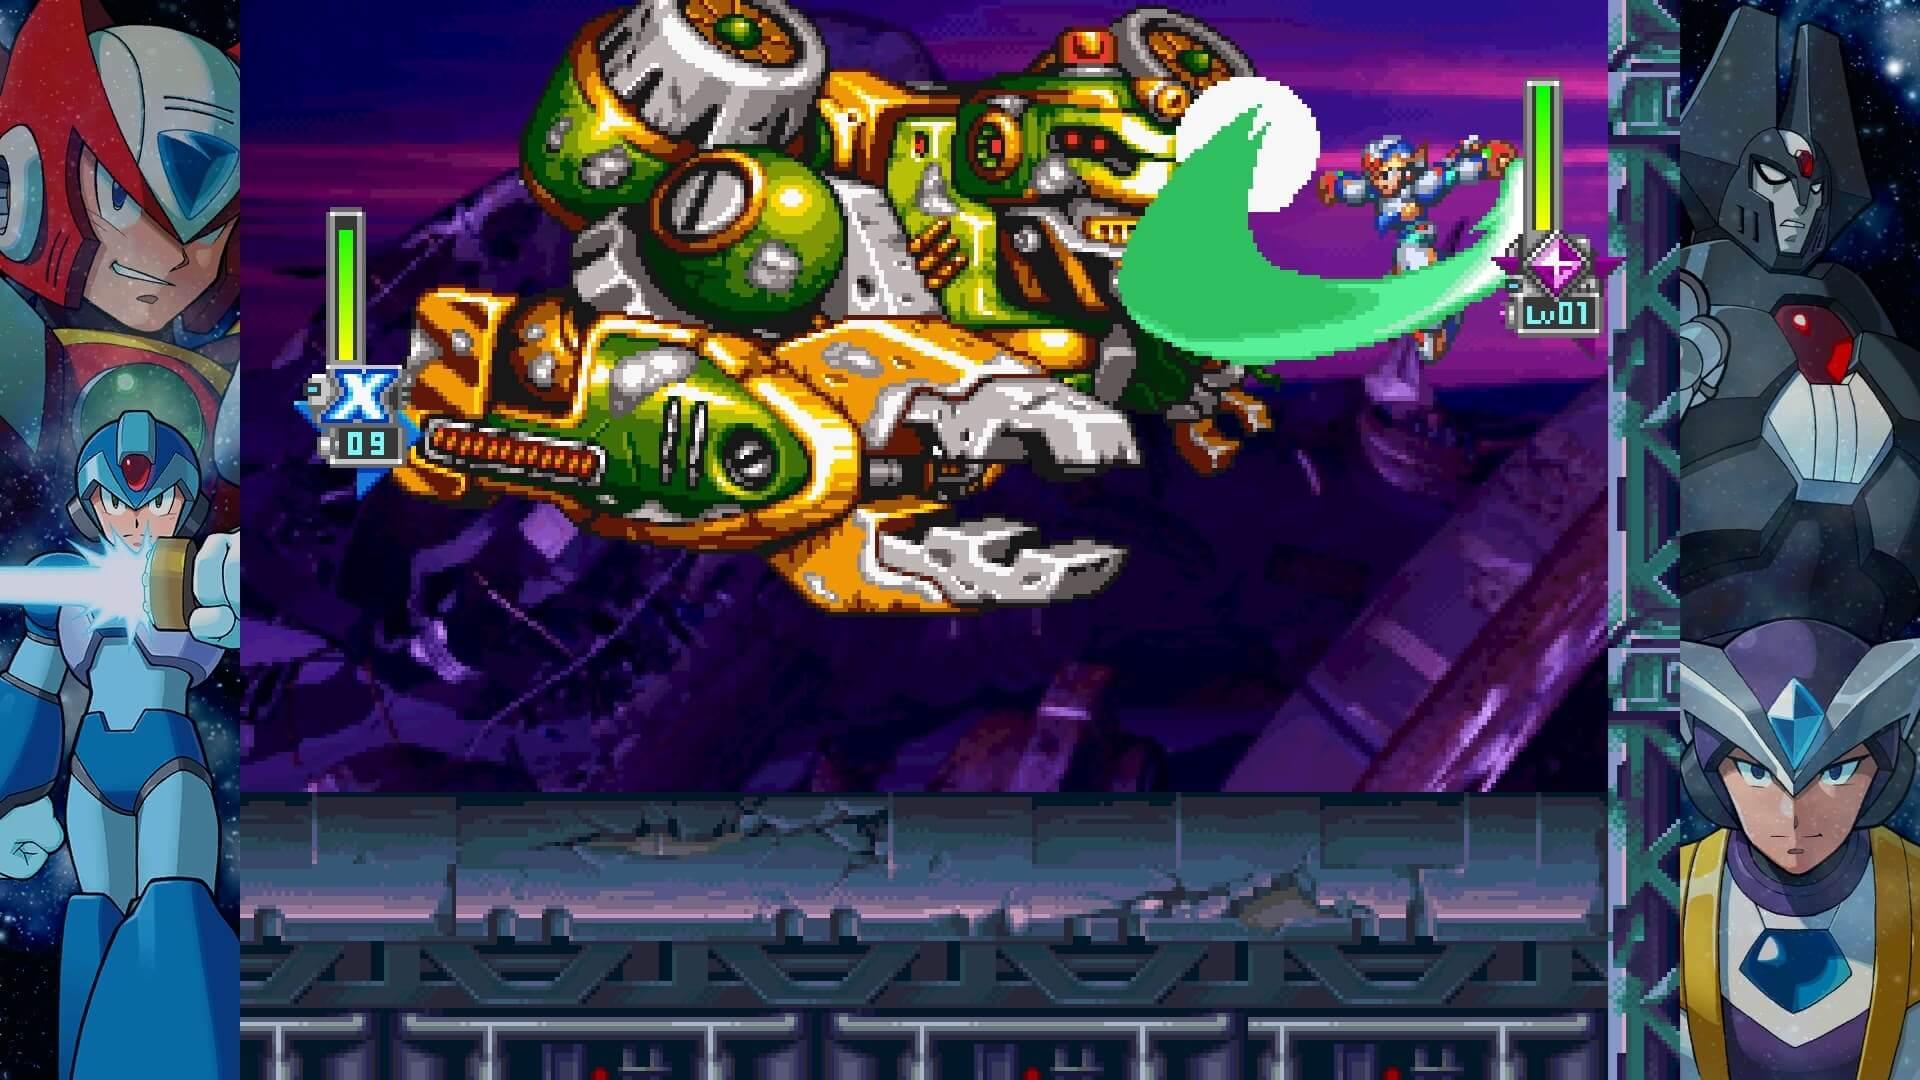 Mega Man™ X Legacy Collection 2 / ロックマンX アニバーサリー コレクション 2 (ROW)